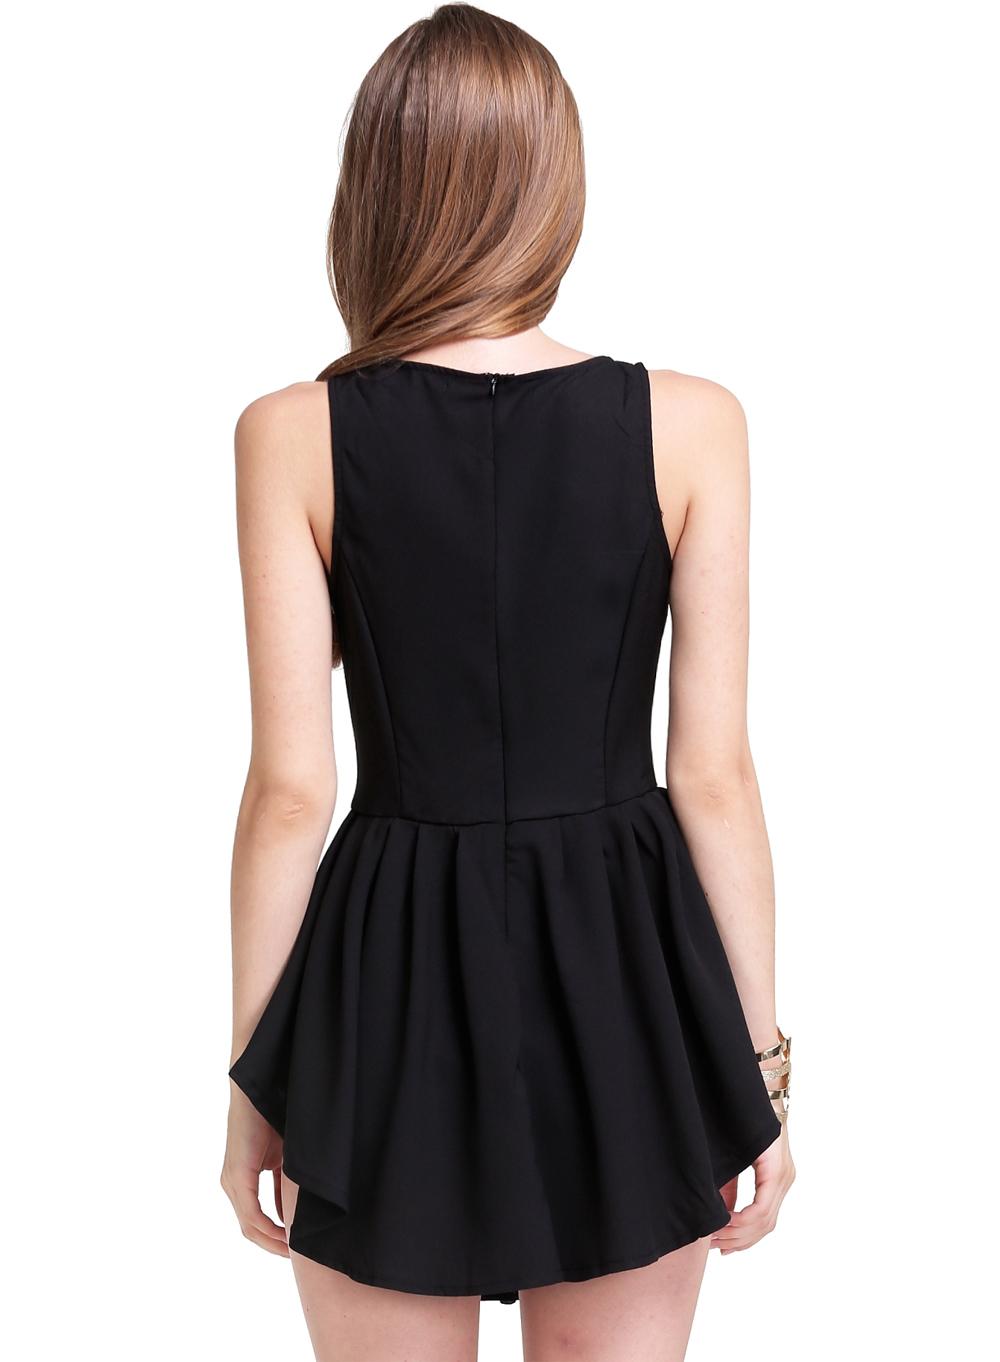 Black Sleeveless Asymmetrical Pleated Flare Dress - Sheinside.com